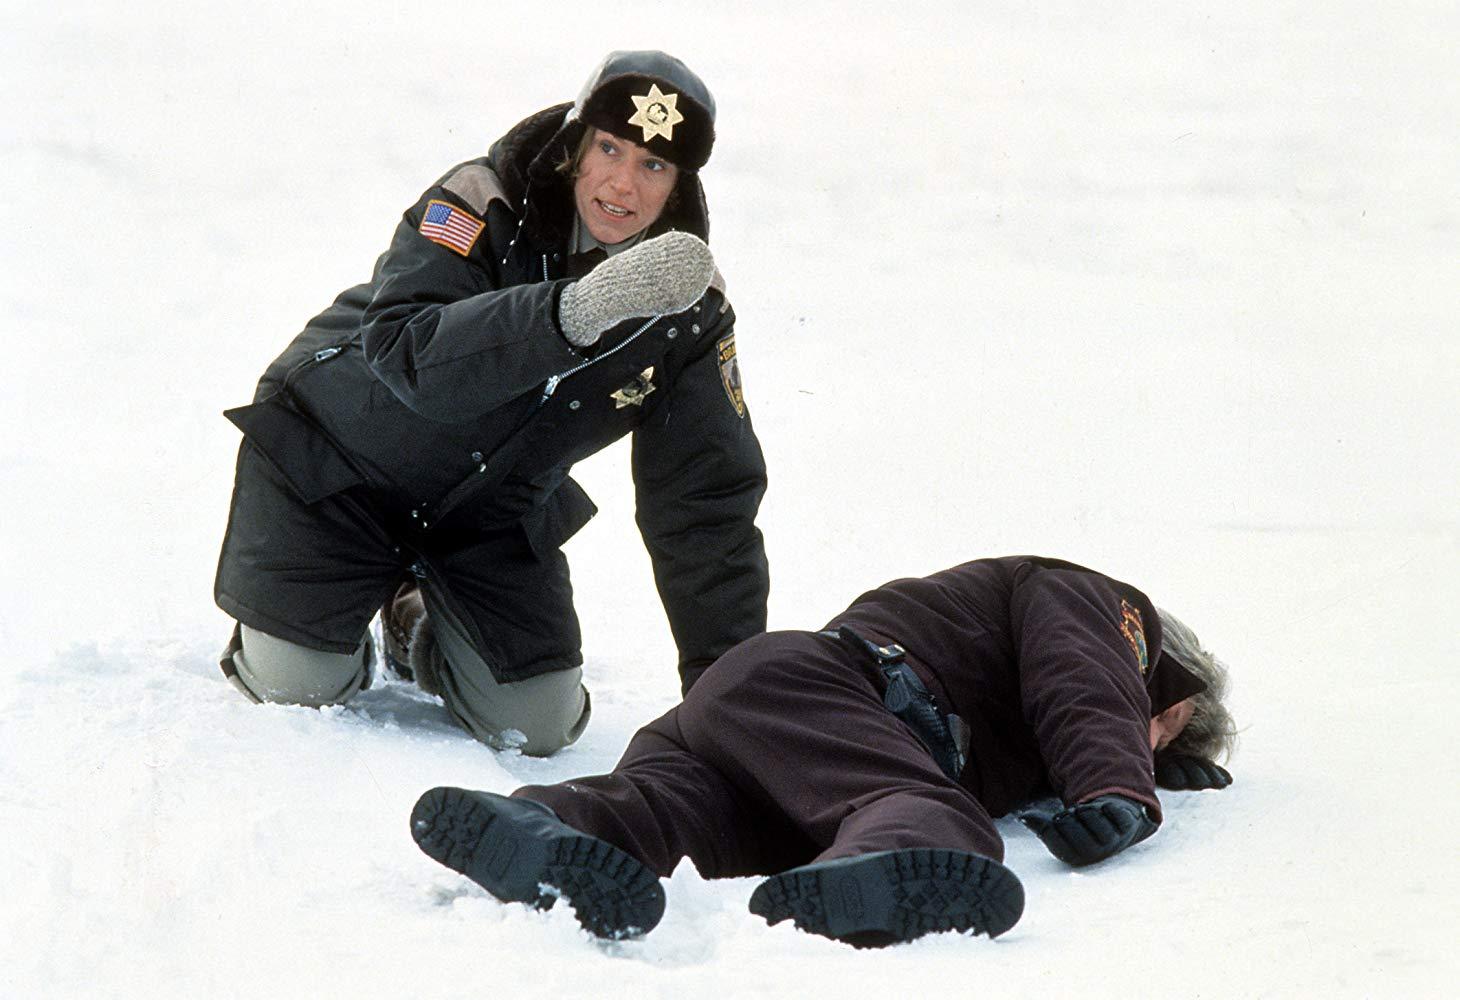 FARGOGJHJ - 10 فیلم جنایی با بن مایه های کمدی سیاه برای دوستداران سریال بریکینگ بد